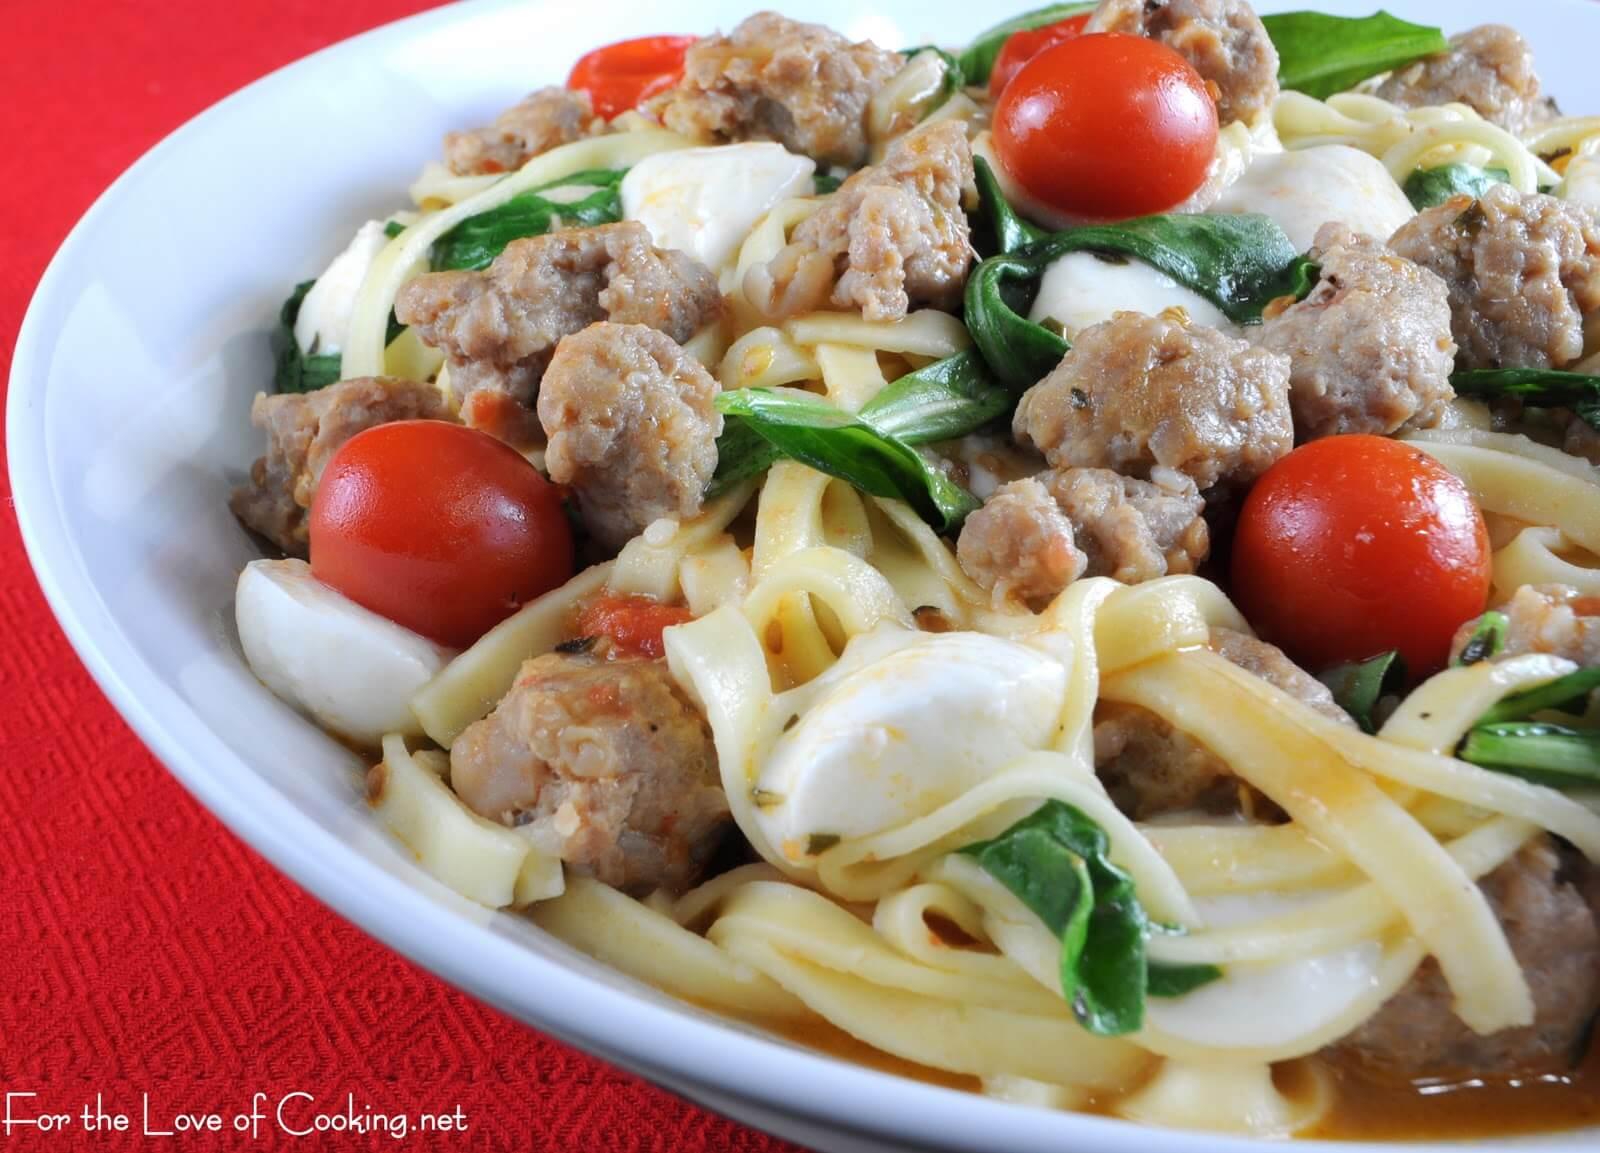 Linguine with Turkey Italian Sausage, Tomatoes, Arugula, and Ciliengini